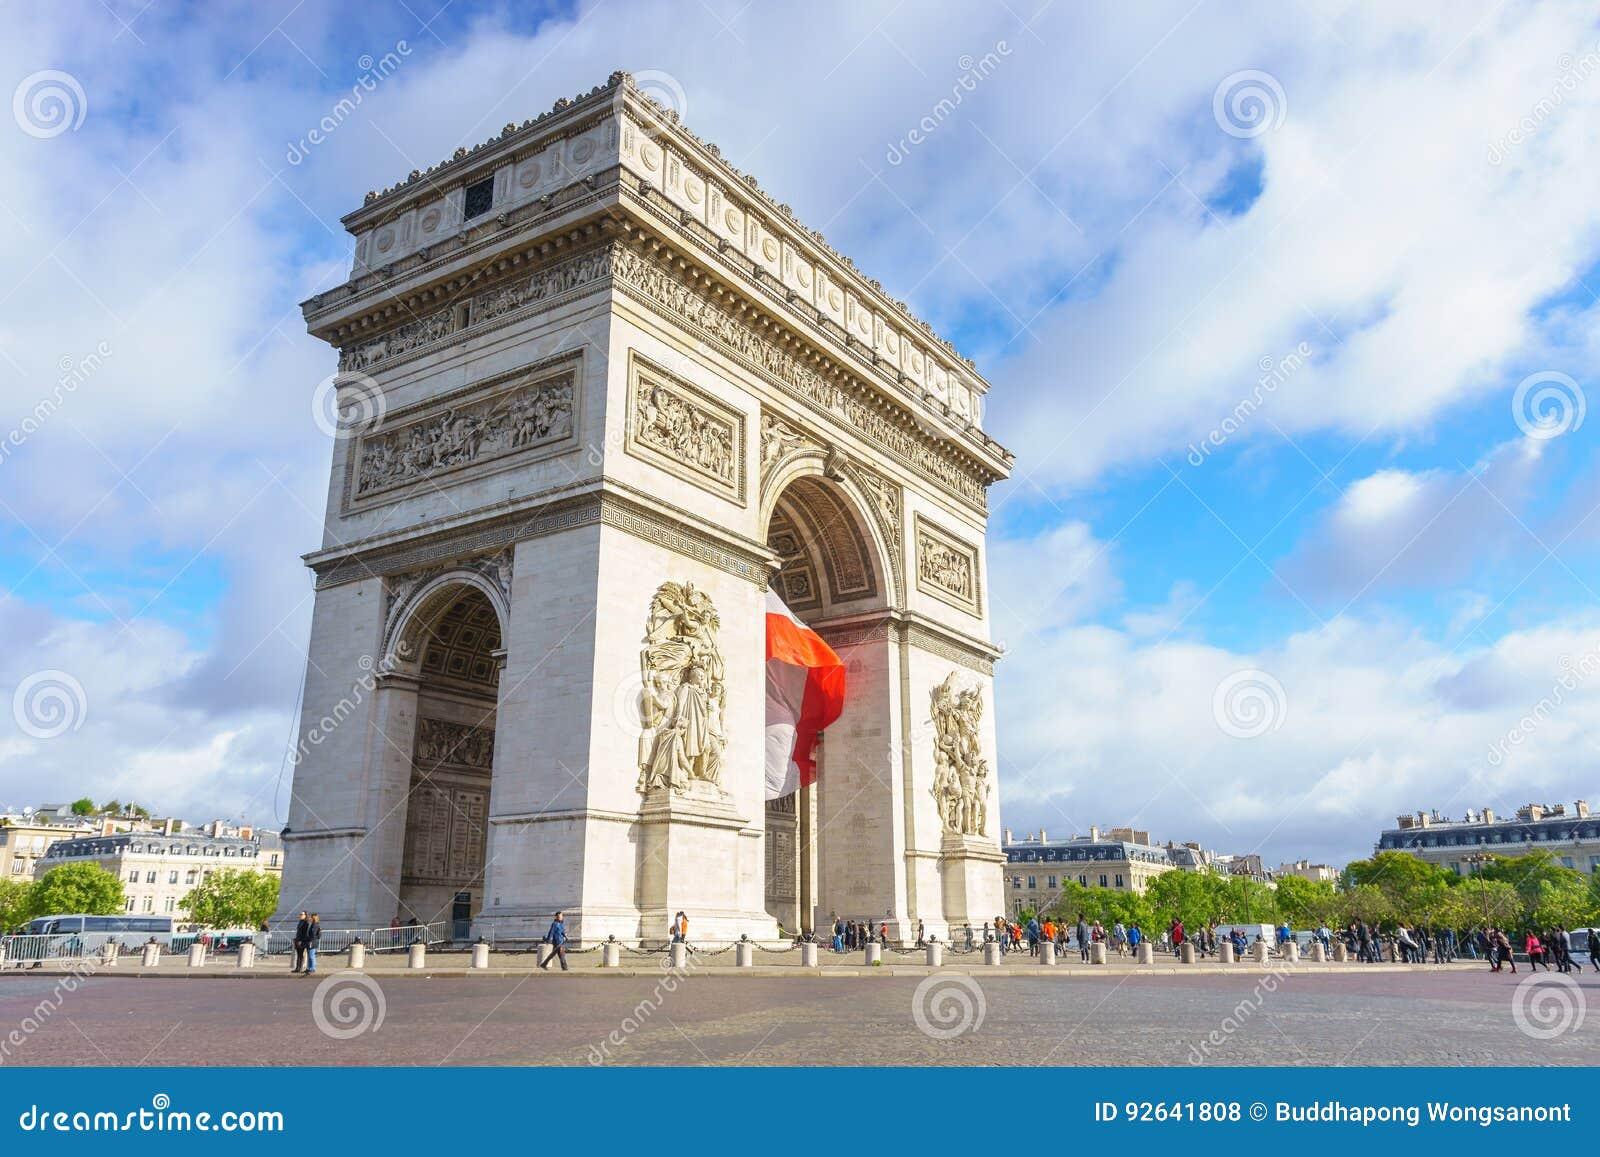 paris france may 1 2017 arc de triomphe arch of triumph editorial stock photo image 92641808. Black Bedroom Furniture Sets. Home Design Ideas